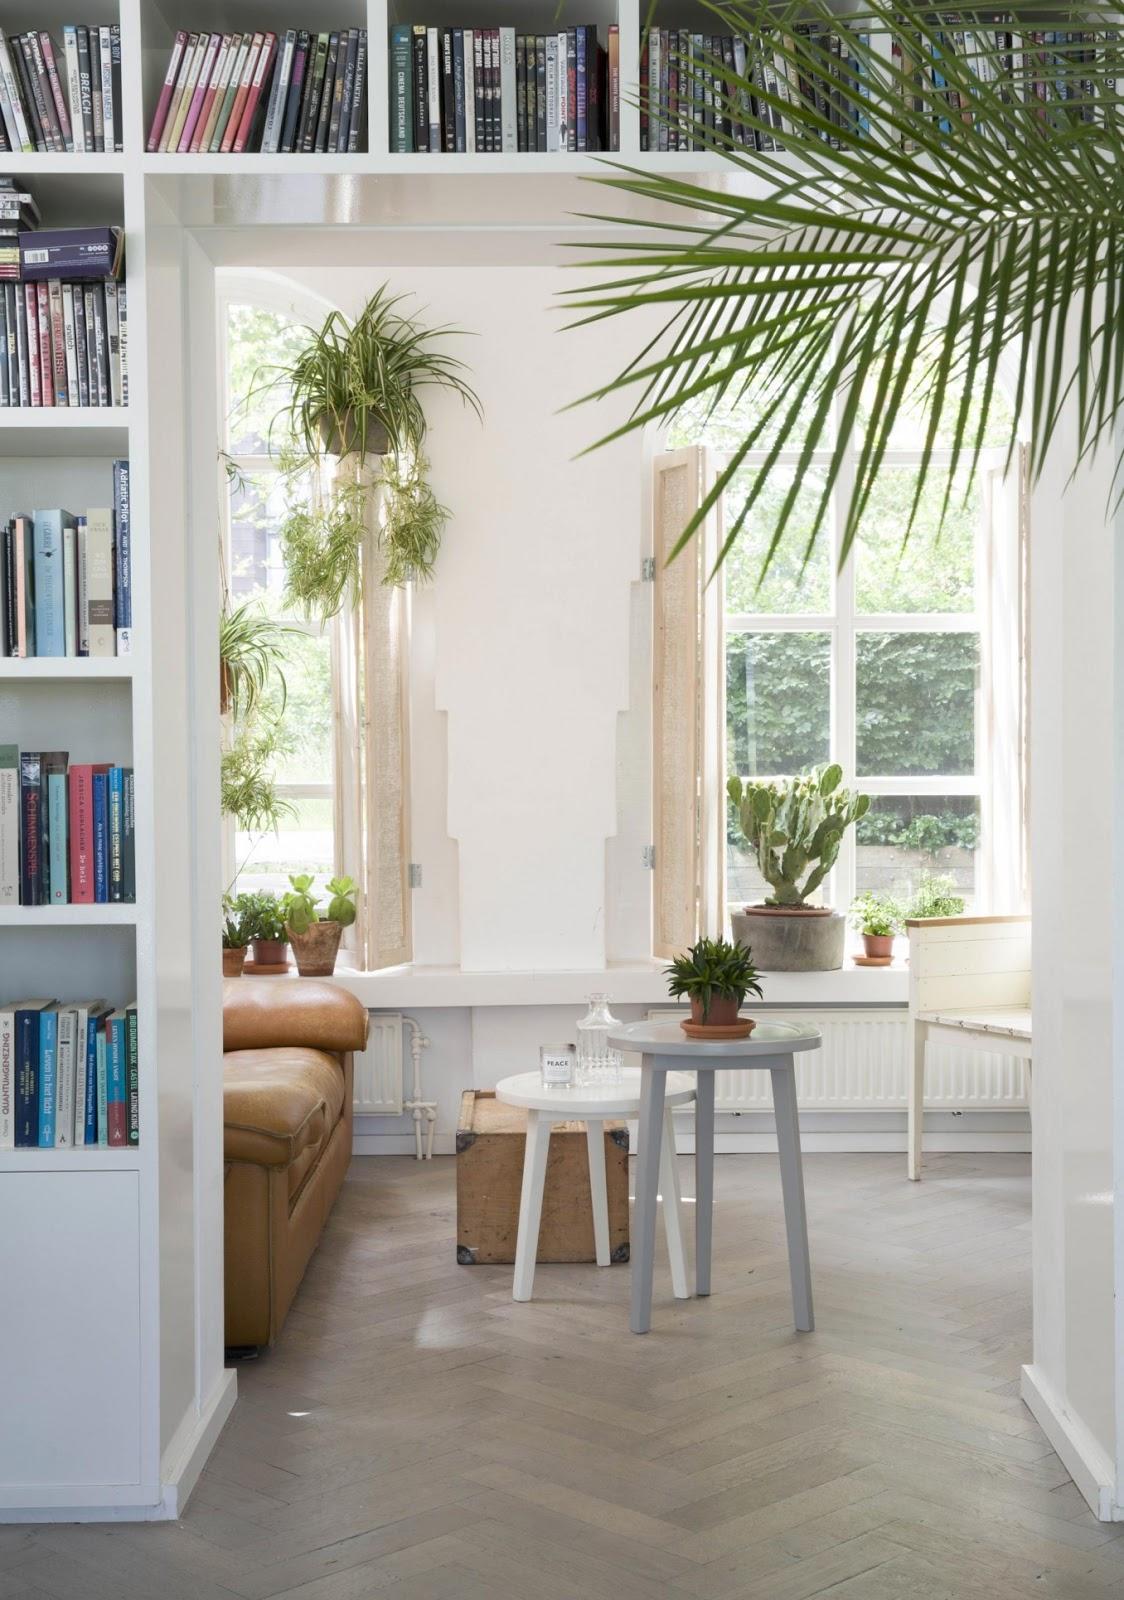 decordemon: Bright and spacious villa in Bentveld, Netherlands